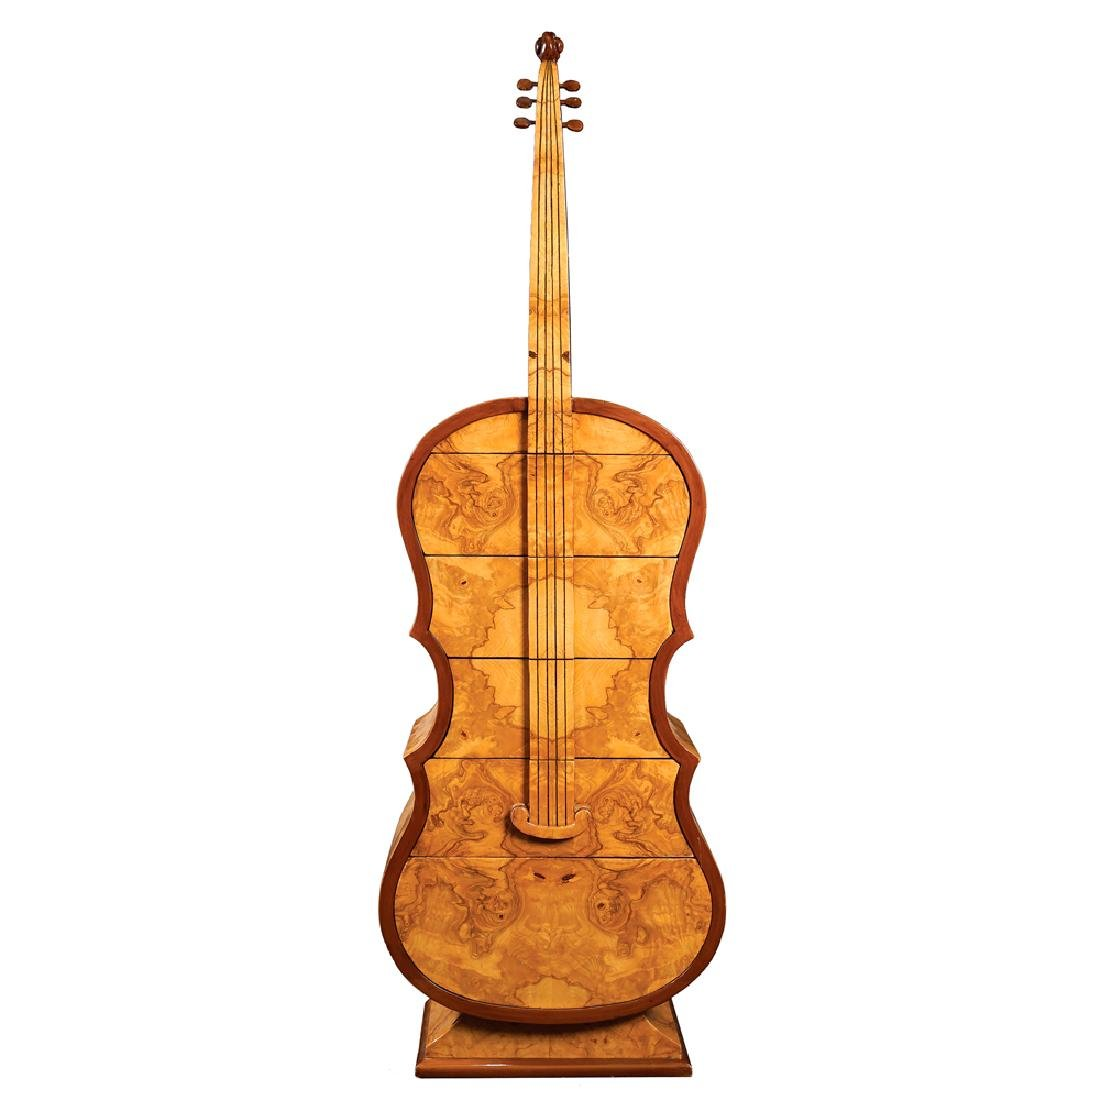 A cello shaped dresser 20th century 155x50x34 cm.